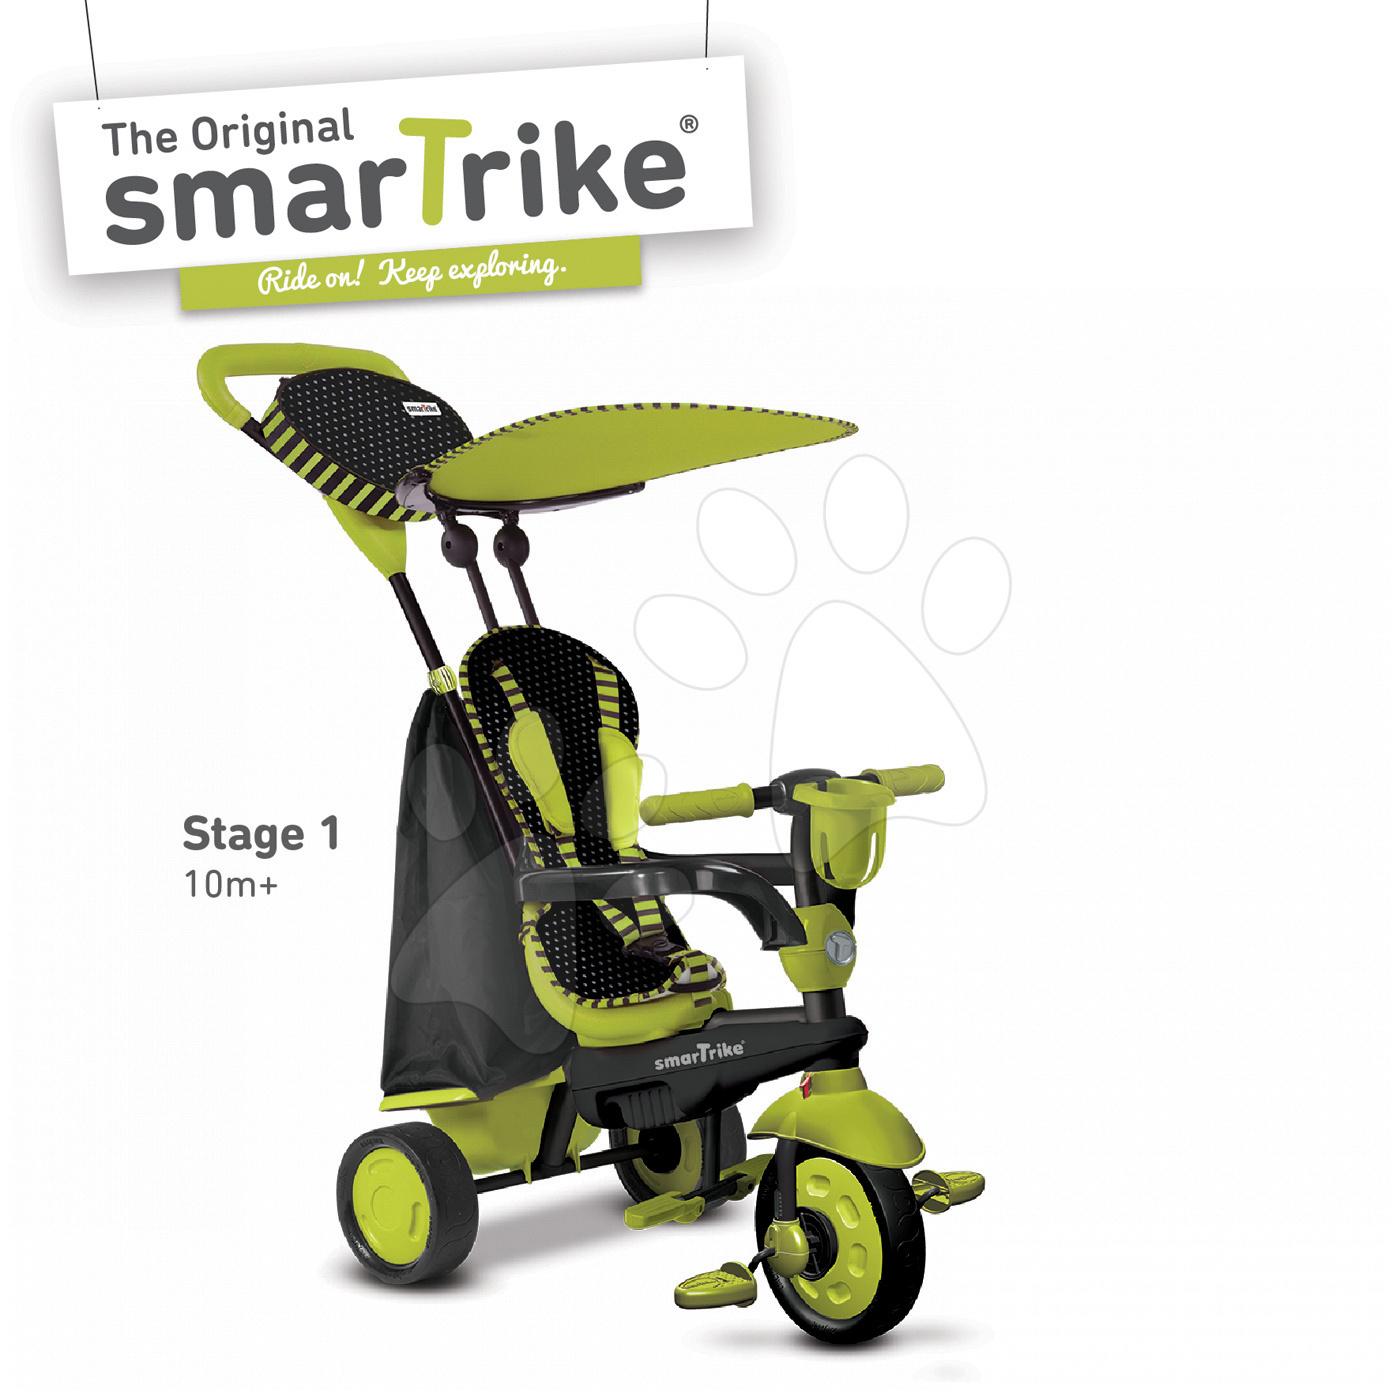 Trojkolky od 10 mesiacov - Trojkolka Spark Touch Steering 4v1 smarTrike zeleno-čierna od 10 mes